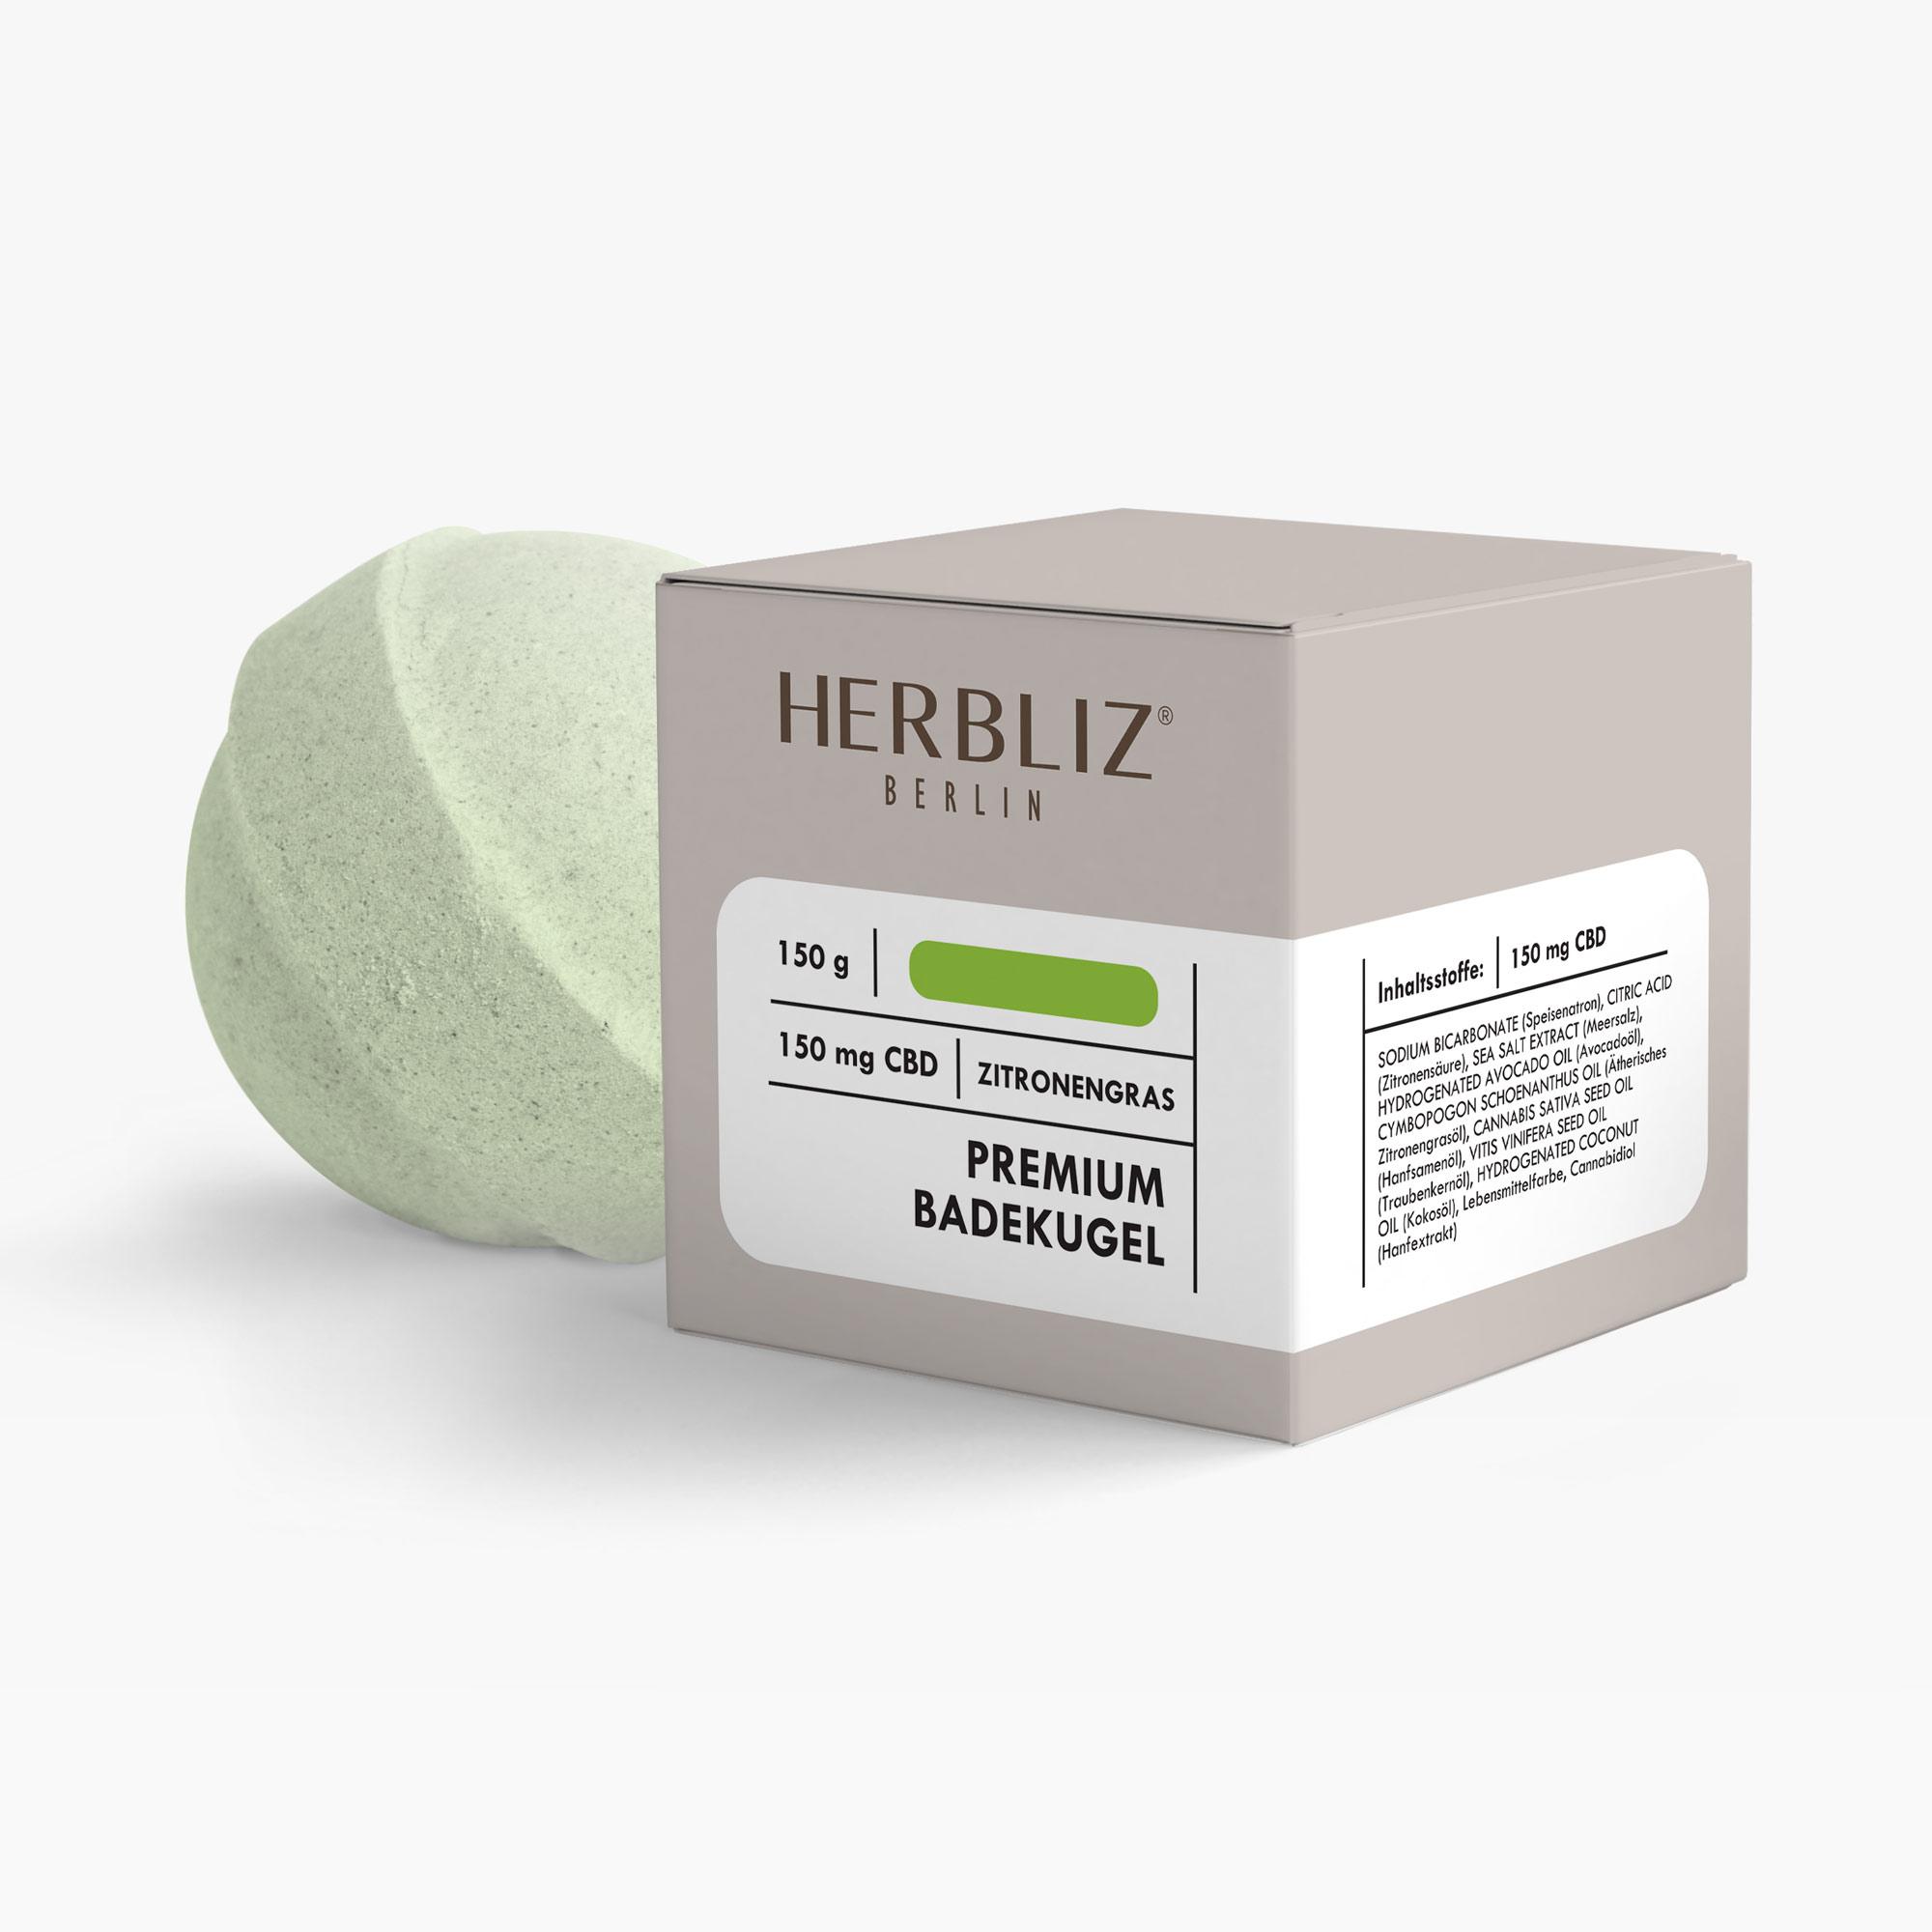 HERBLIZ_Bathbomb_Zitrongras_150g_2